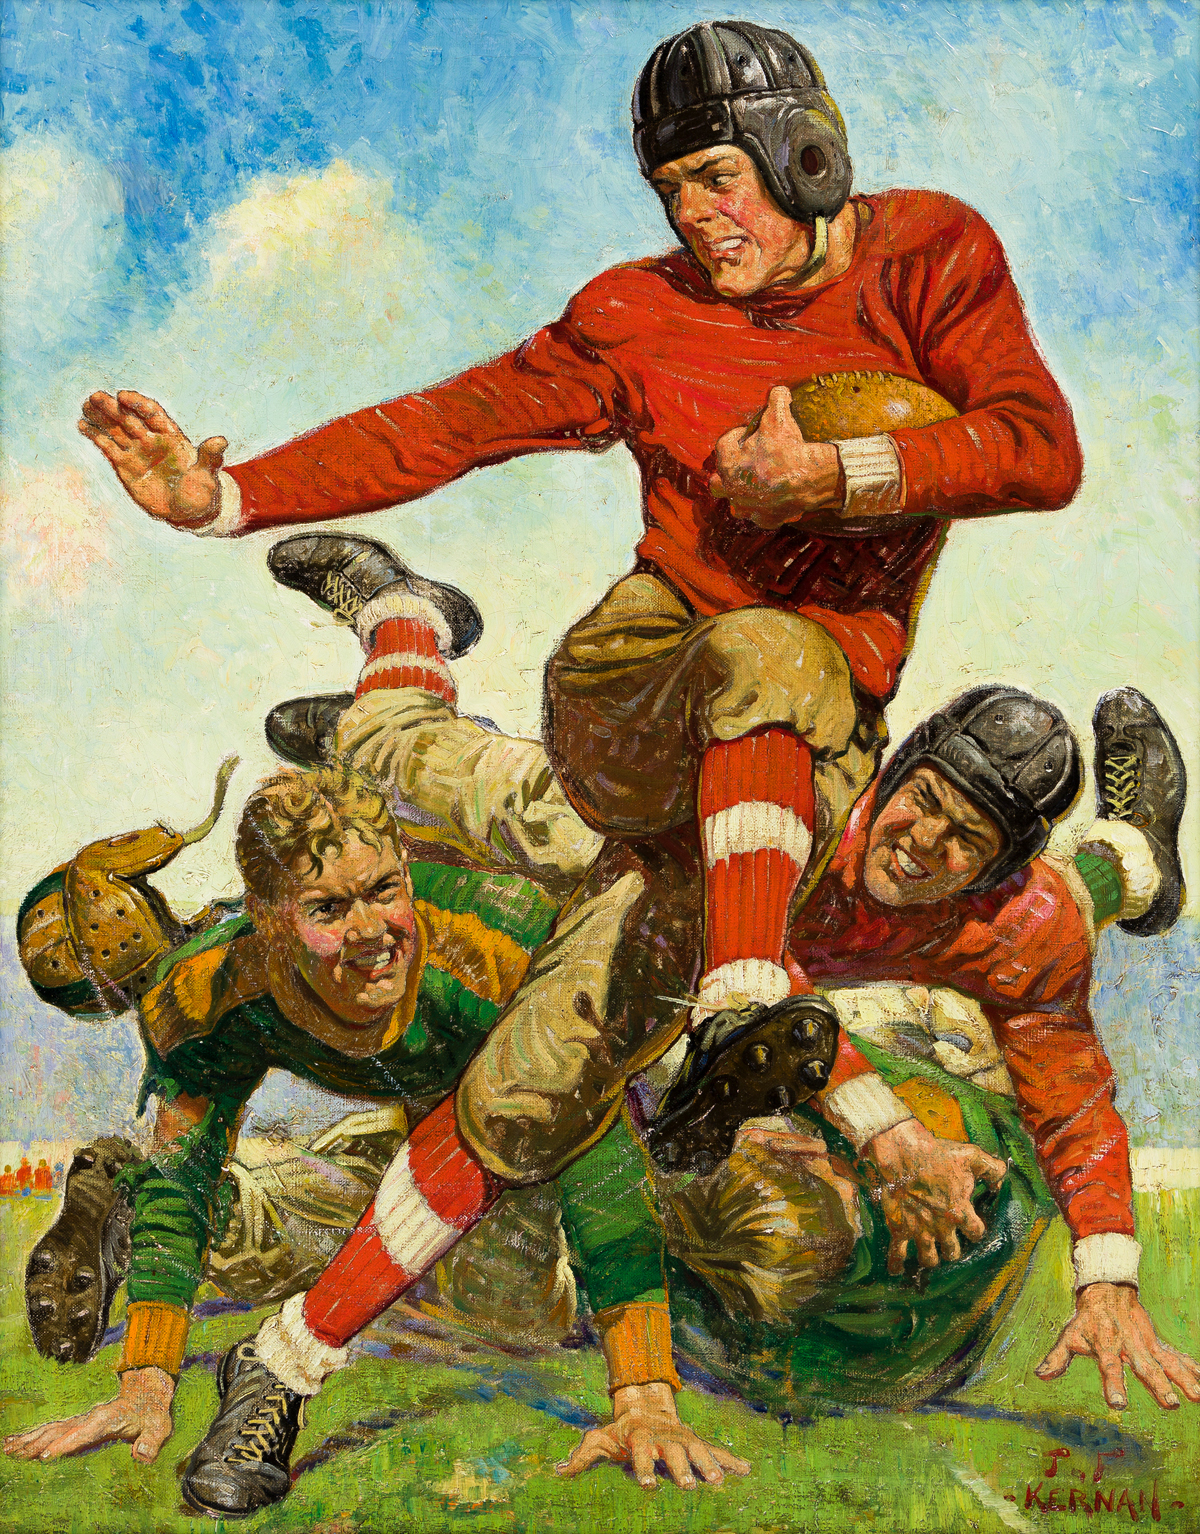 JOSEPH F. KERNAN (1878-1958) College Football. [SATURDAY EVENING POST / COVER ART / HEISMAN]